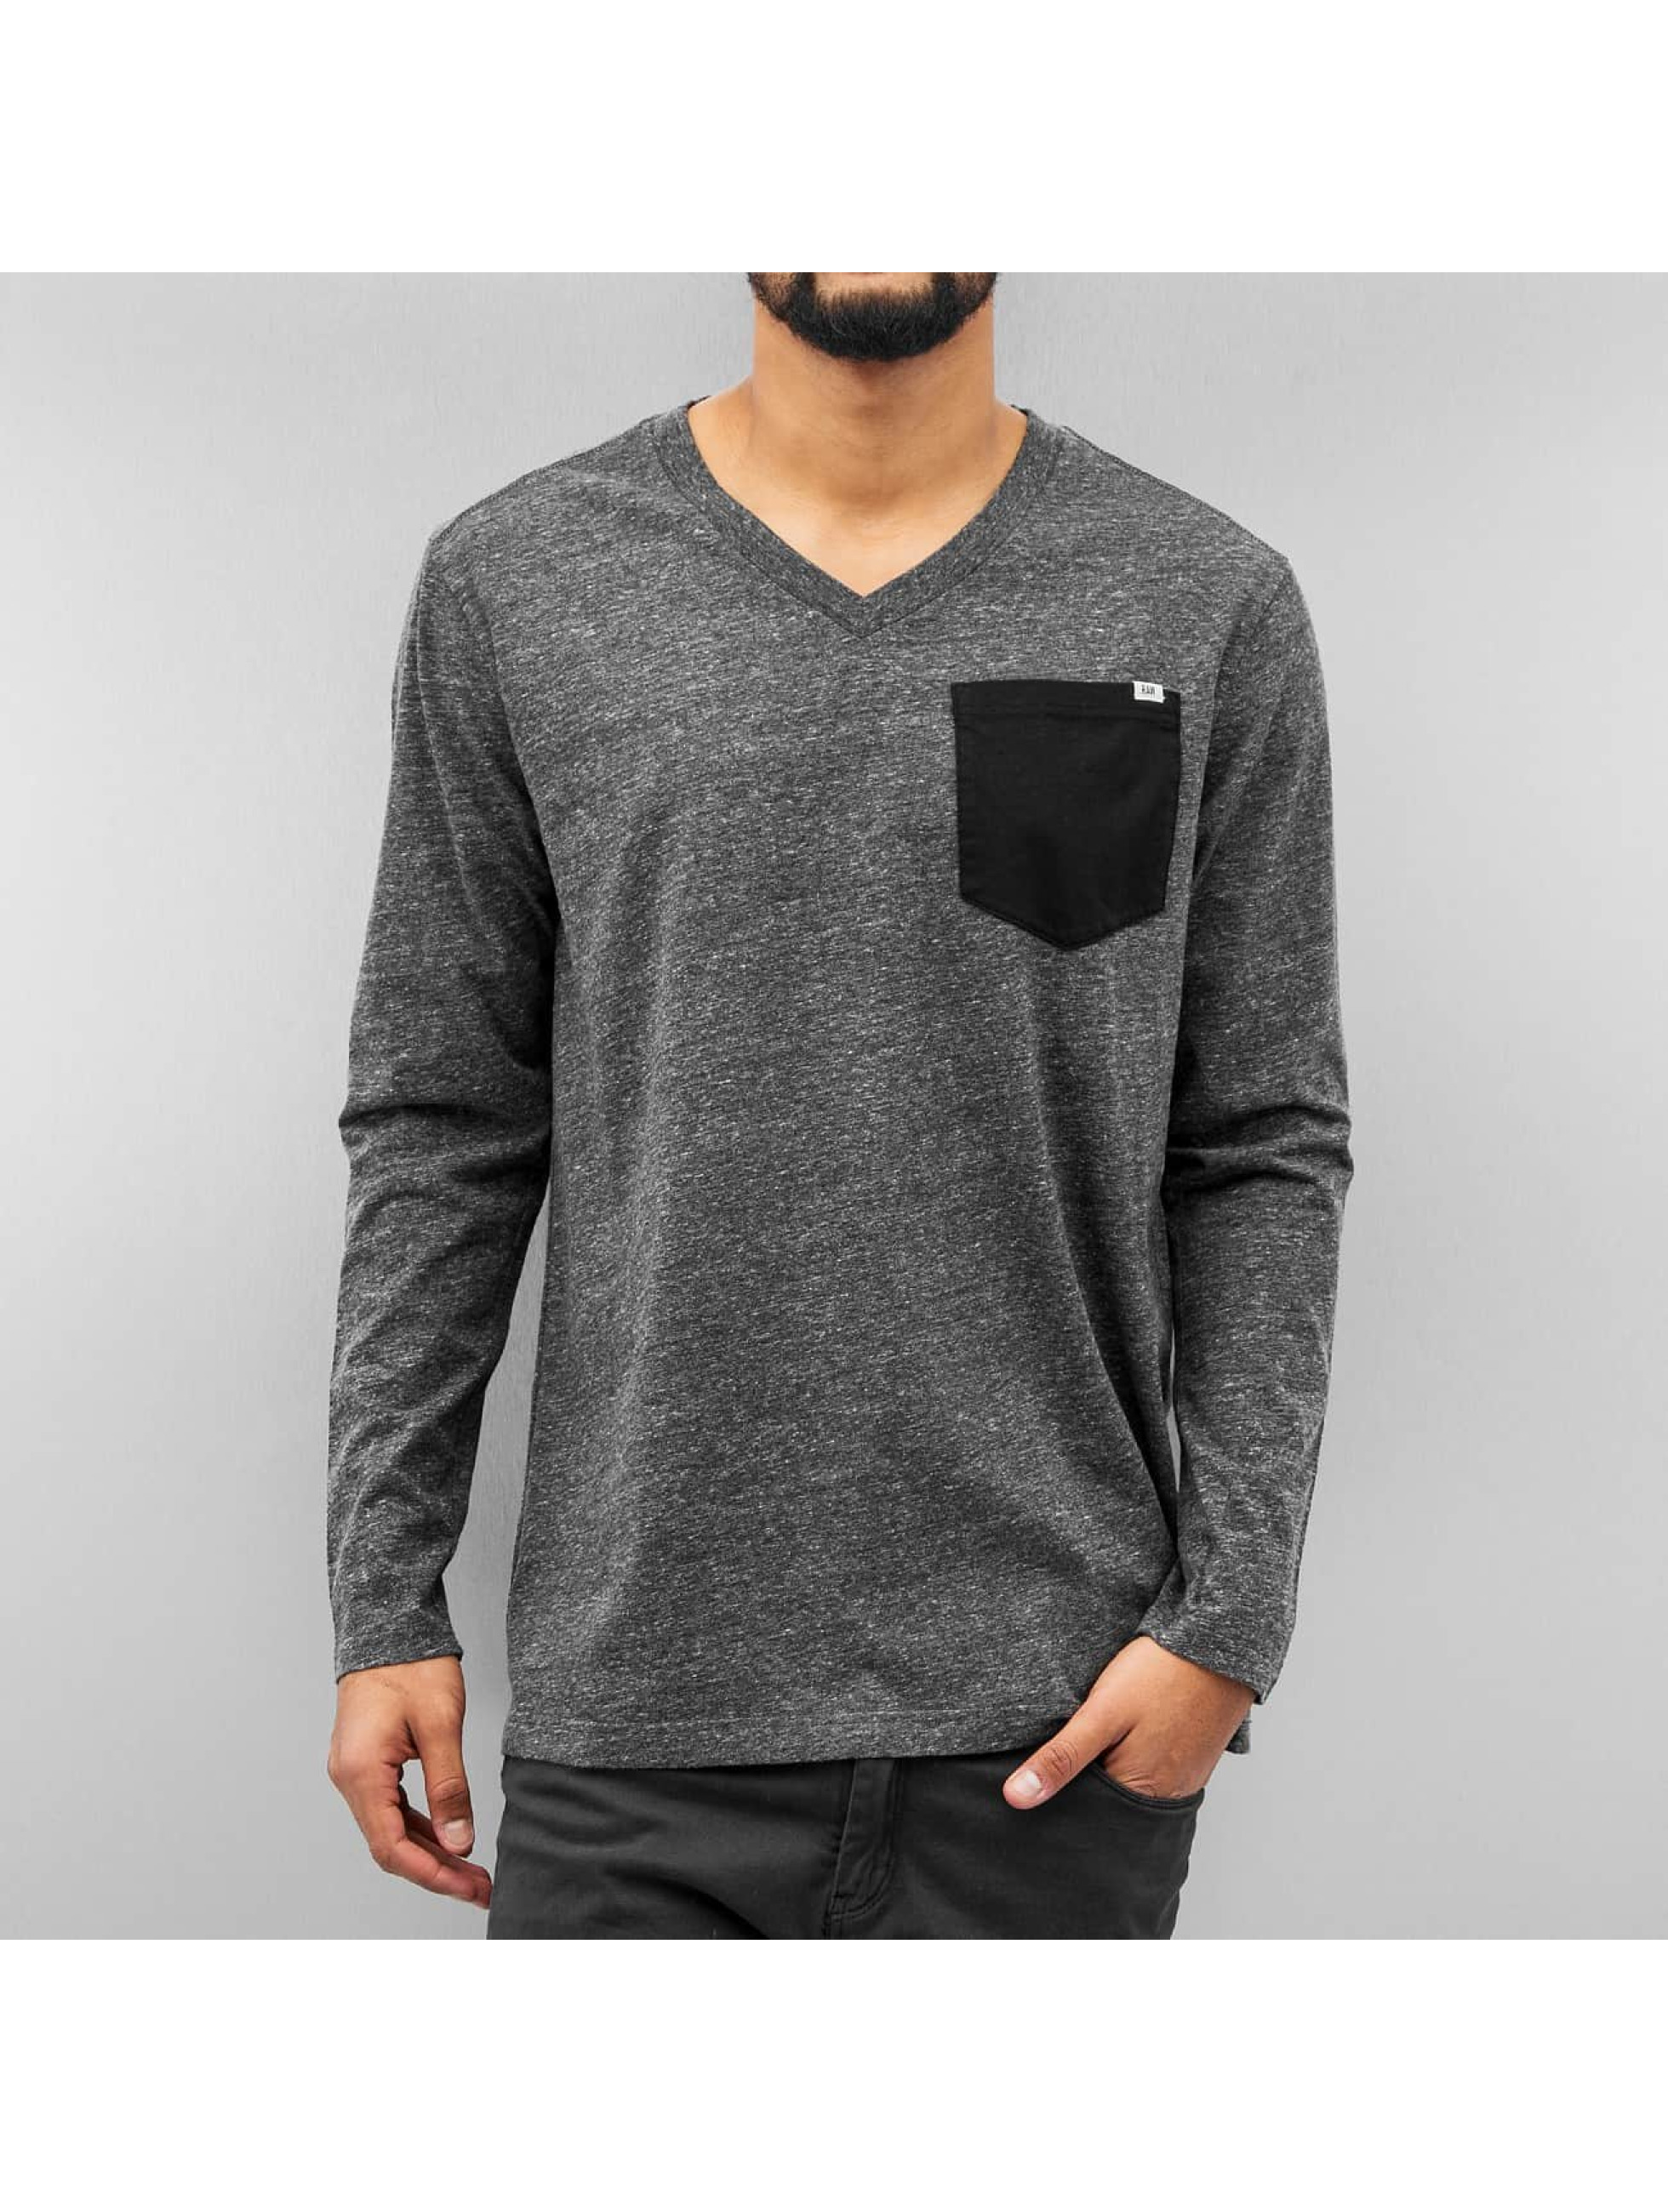 G-Star Longsleeve Riban Pocket Premium Compact Jersey grau